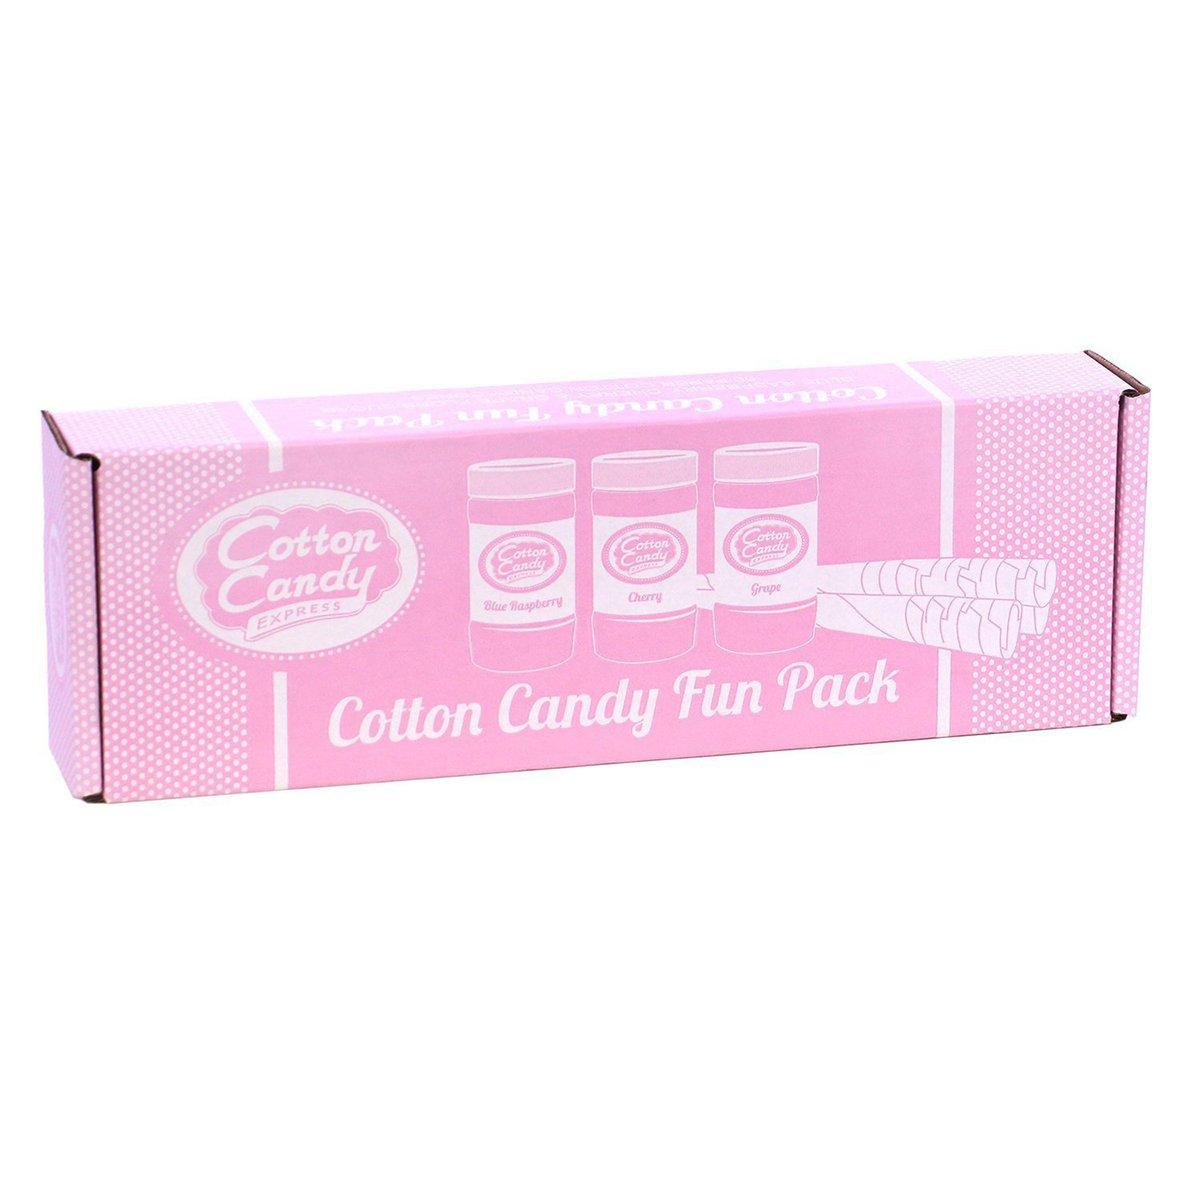 Cotton Candy Floss 50-Cones Flossine Sugar Flavoring Machine Maker Supplies Kit